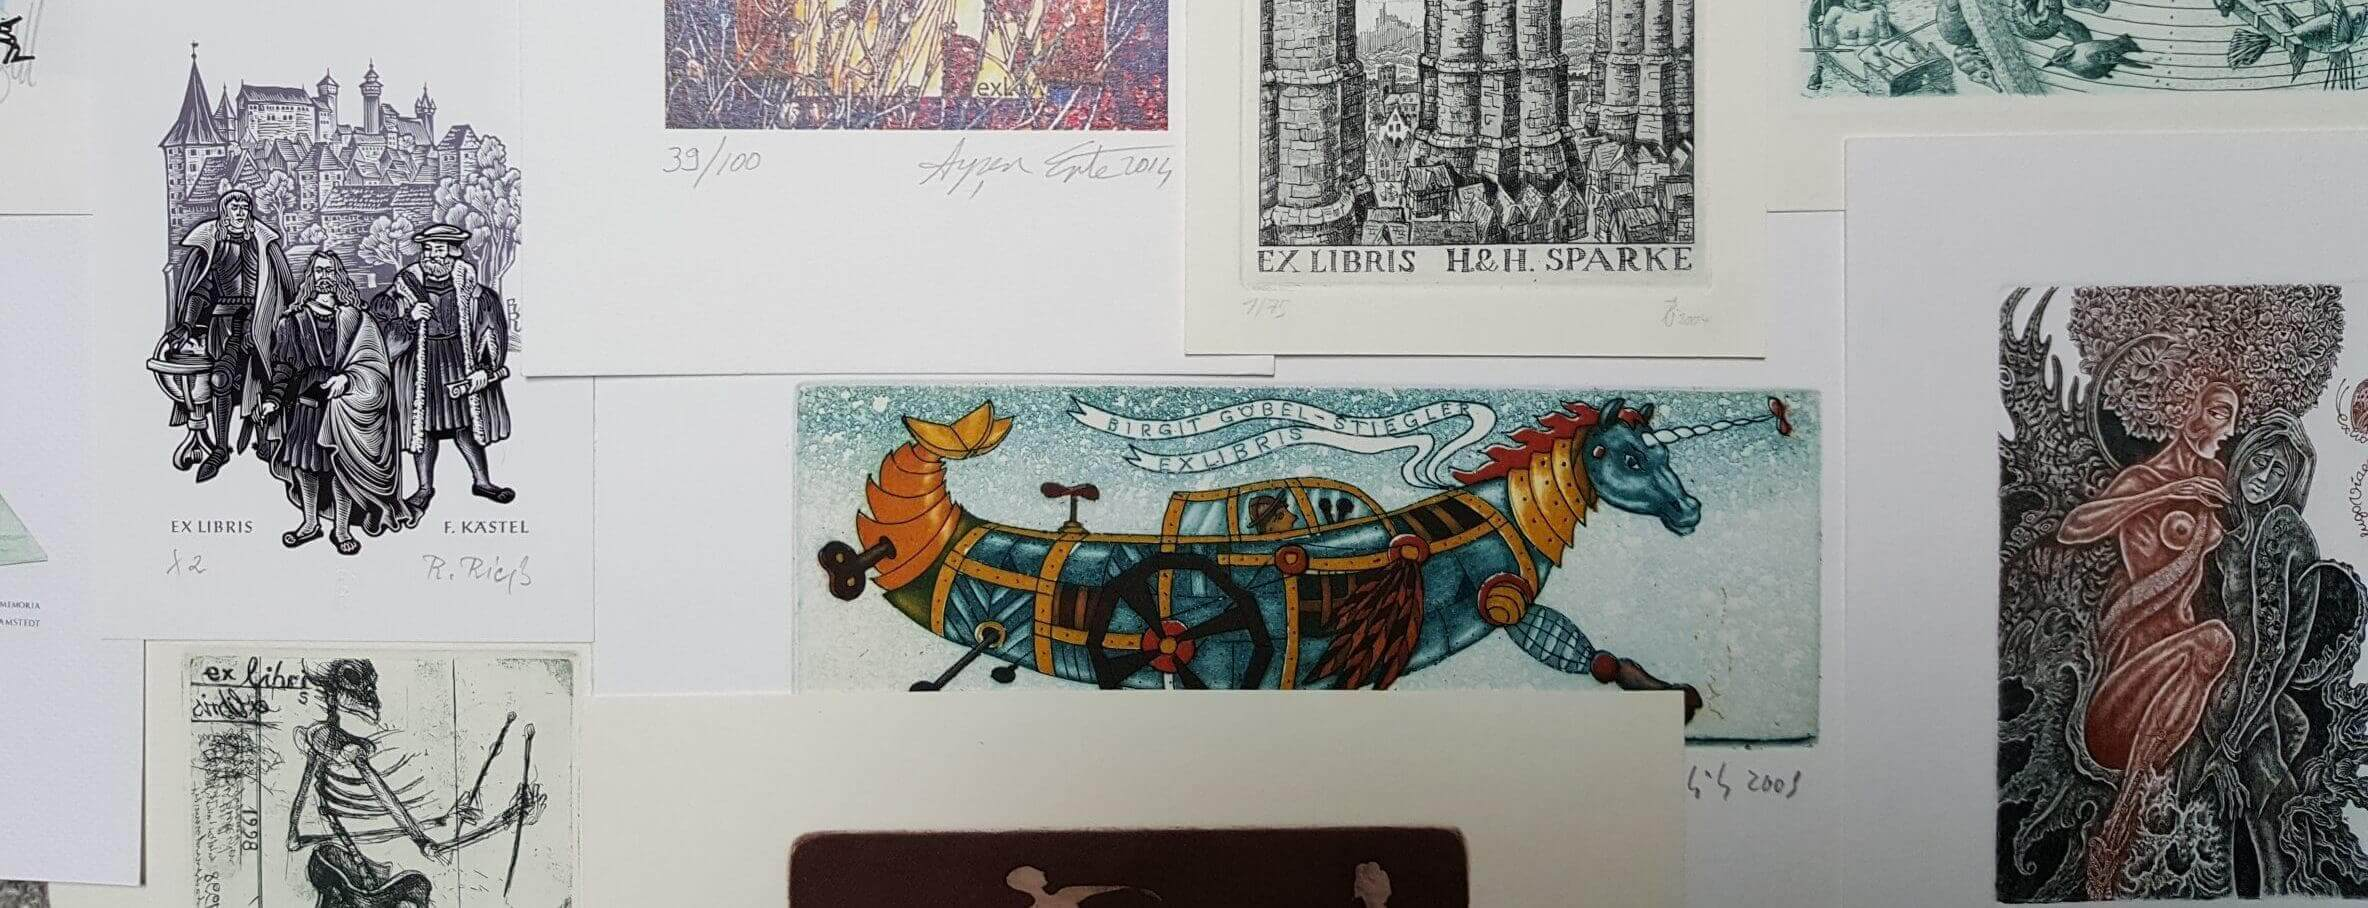 Website Bild Künstler+Archiv(e) - Künstler 1 Künstler-Galerien